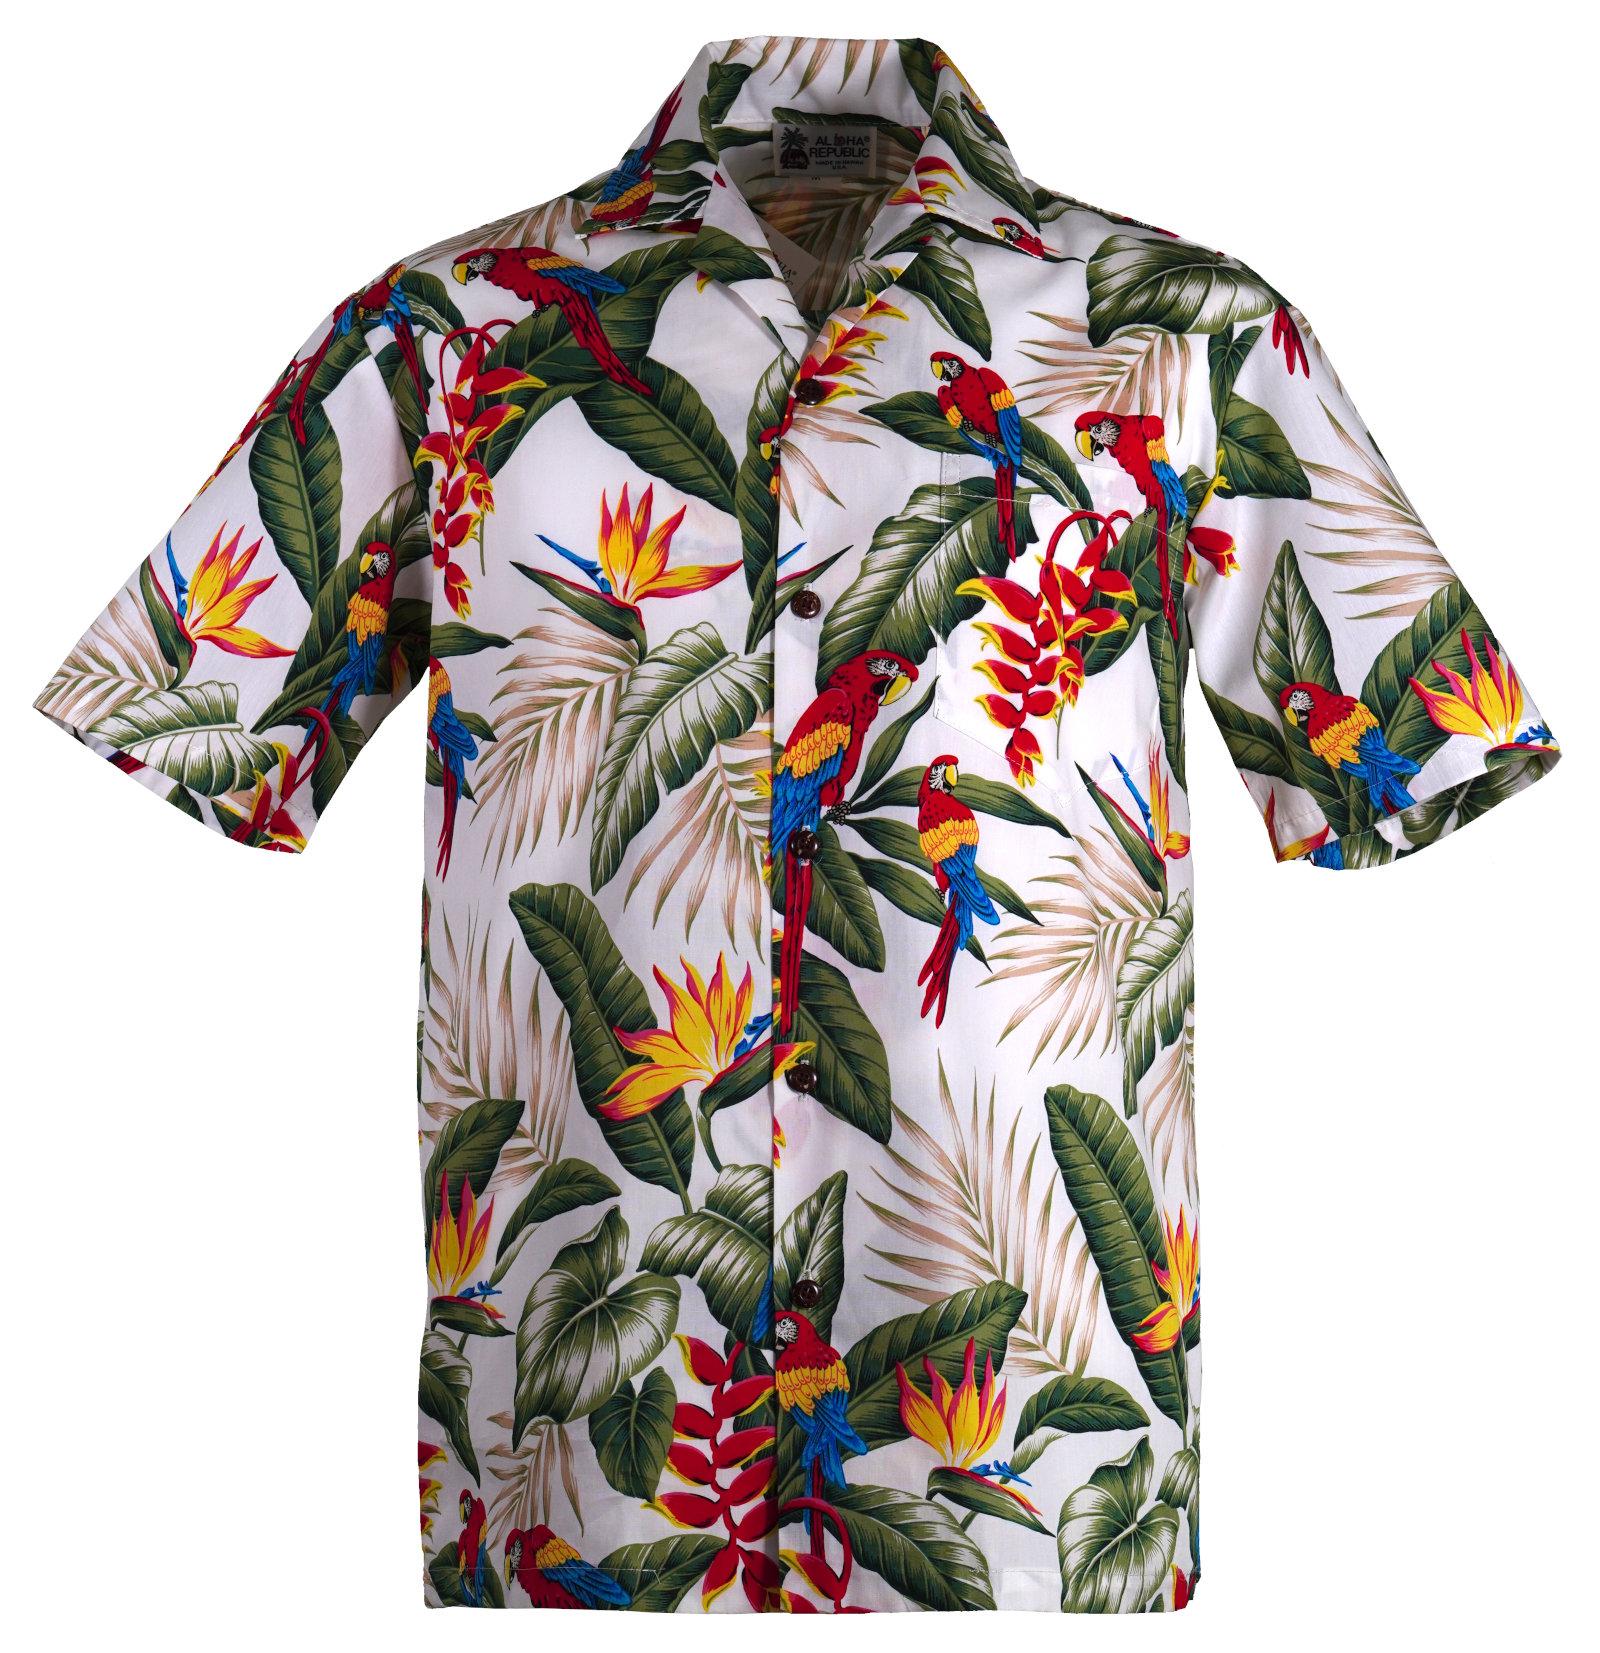 Original Hawaiihemd -JungleHoot-